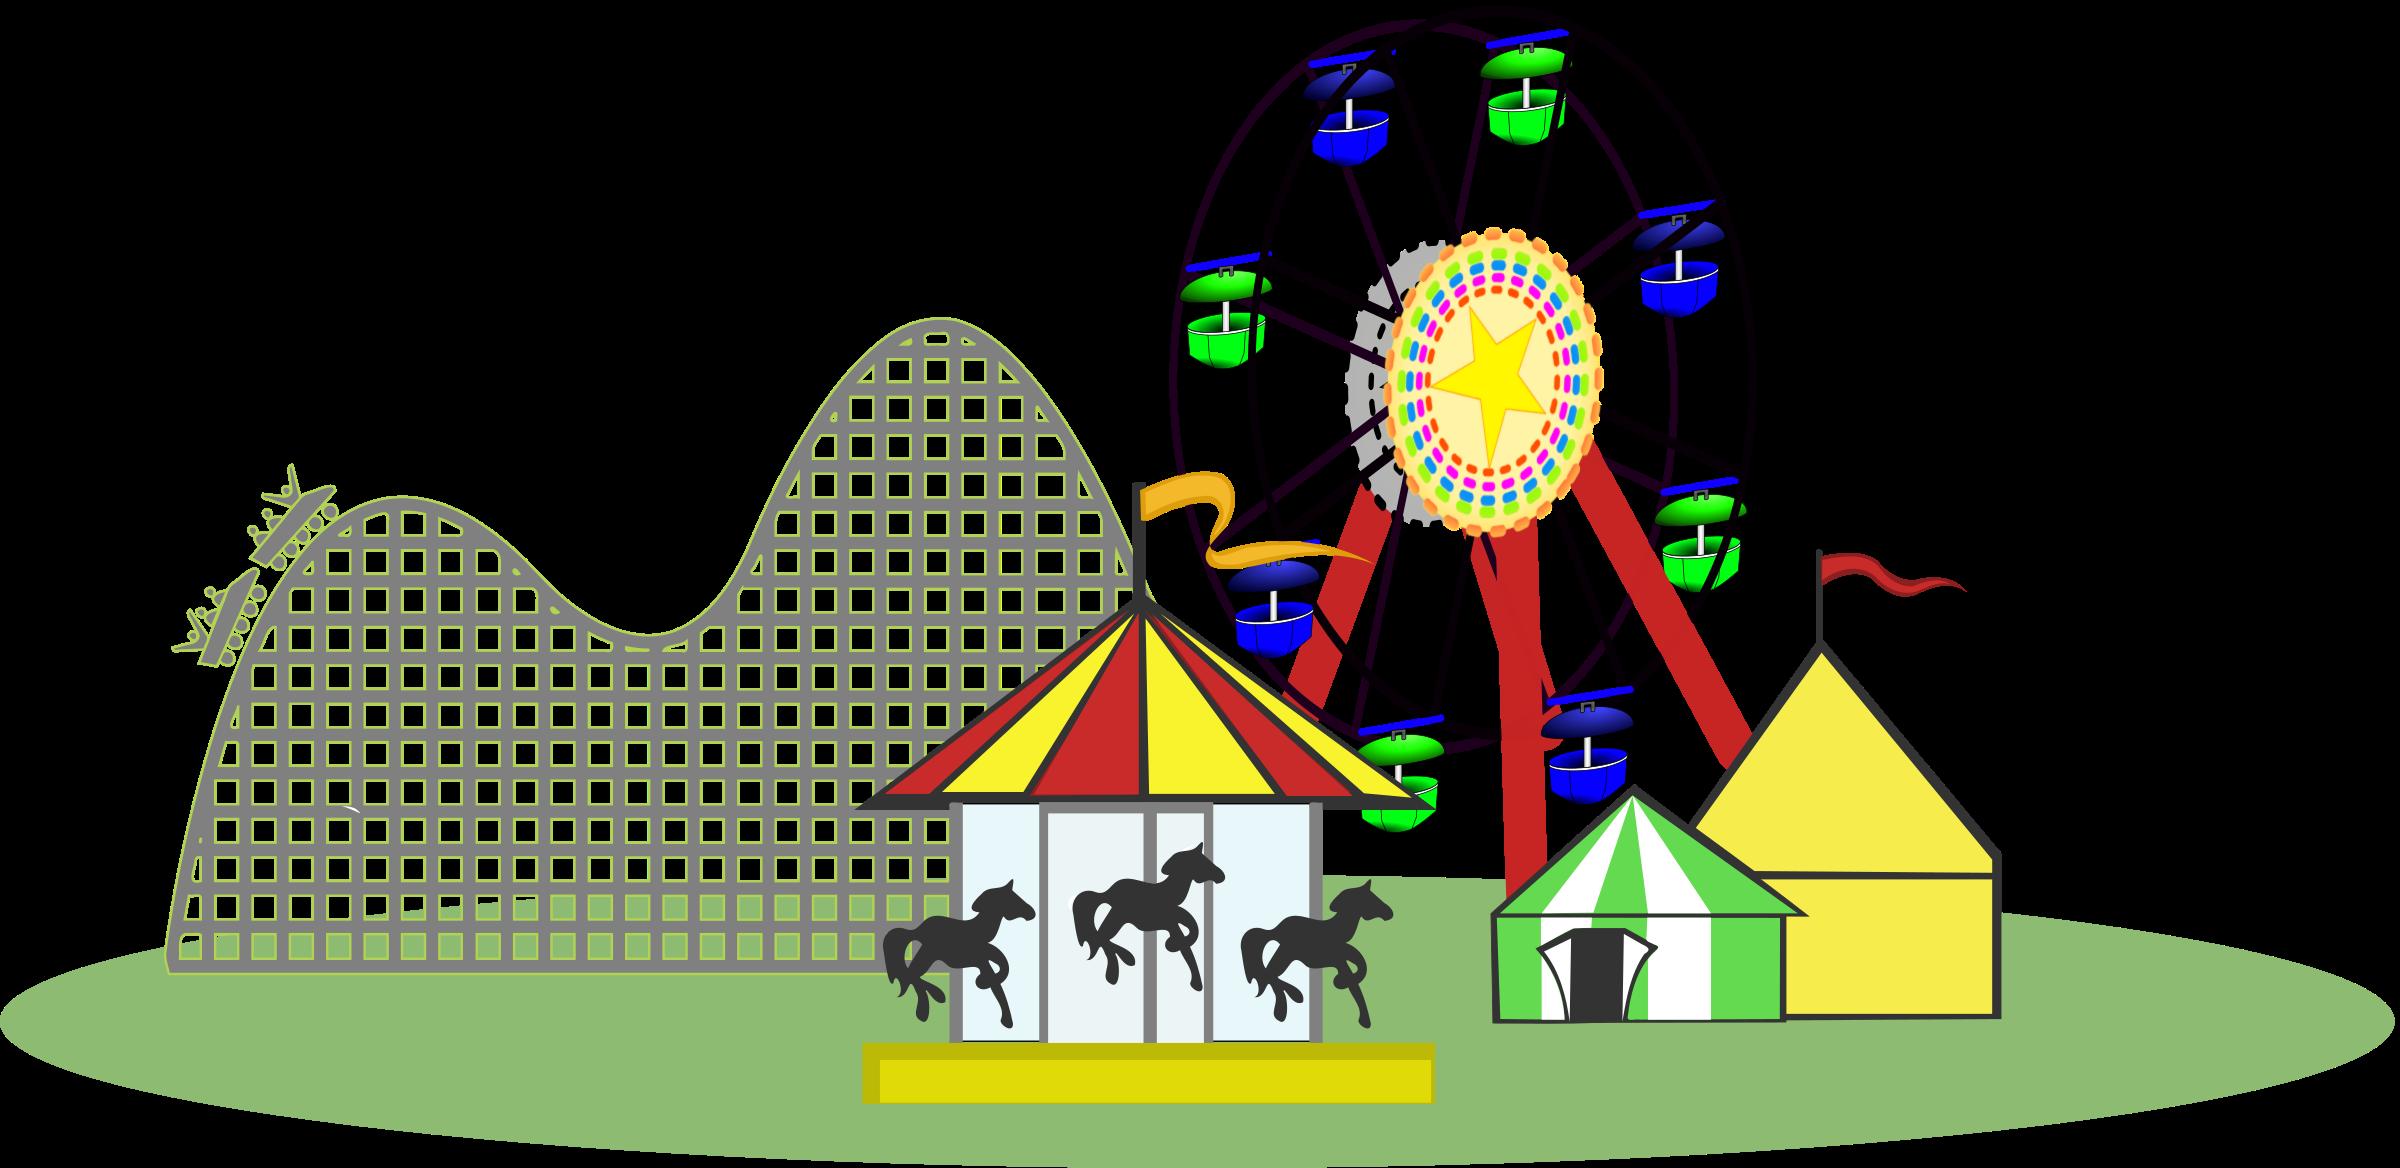 fair clipart fairground ride